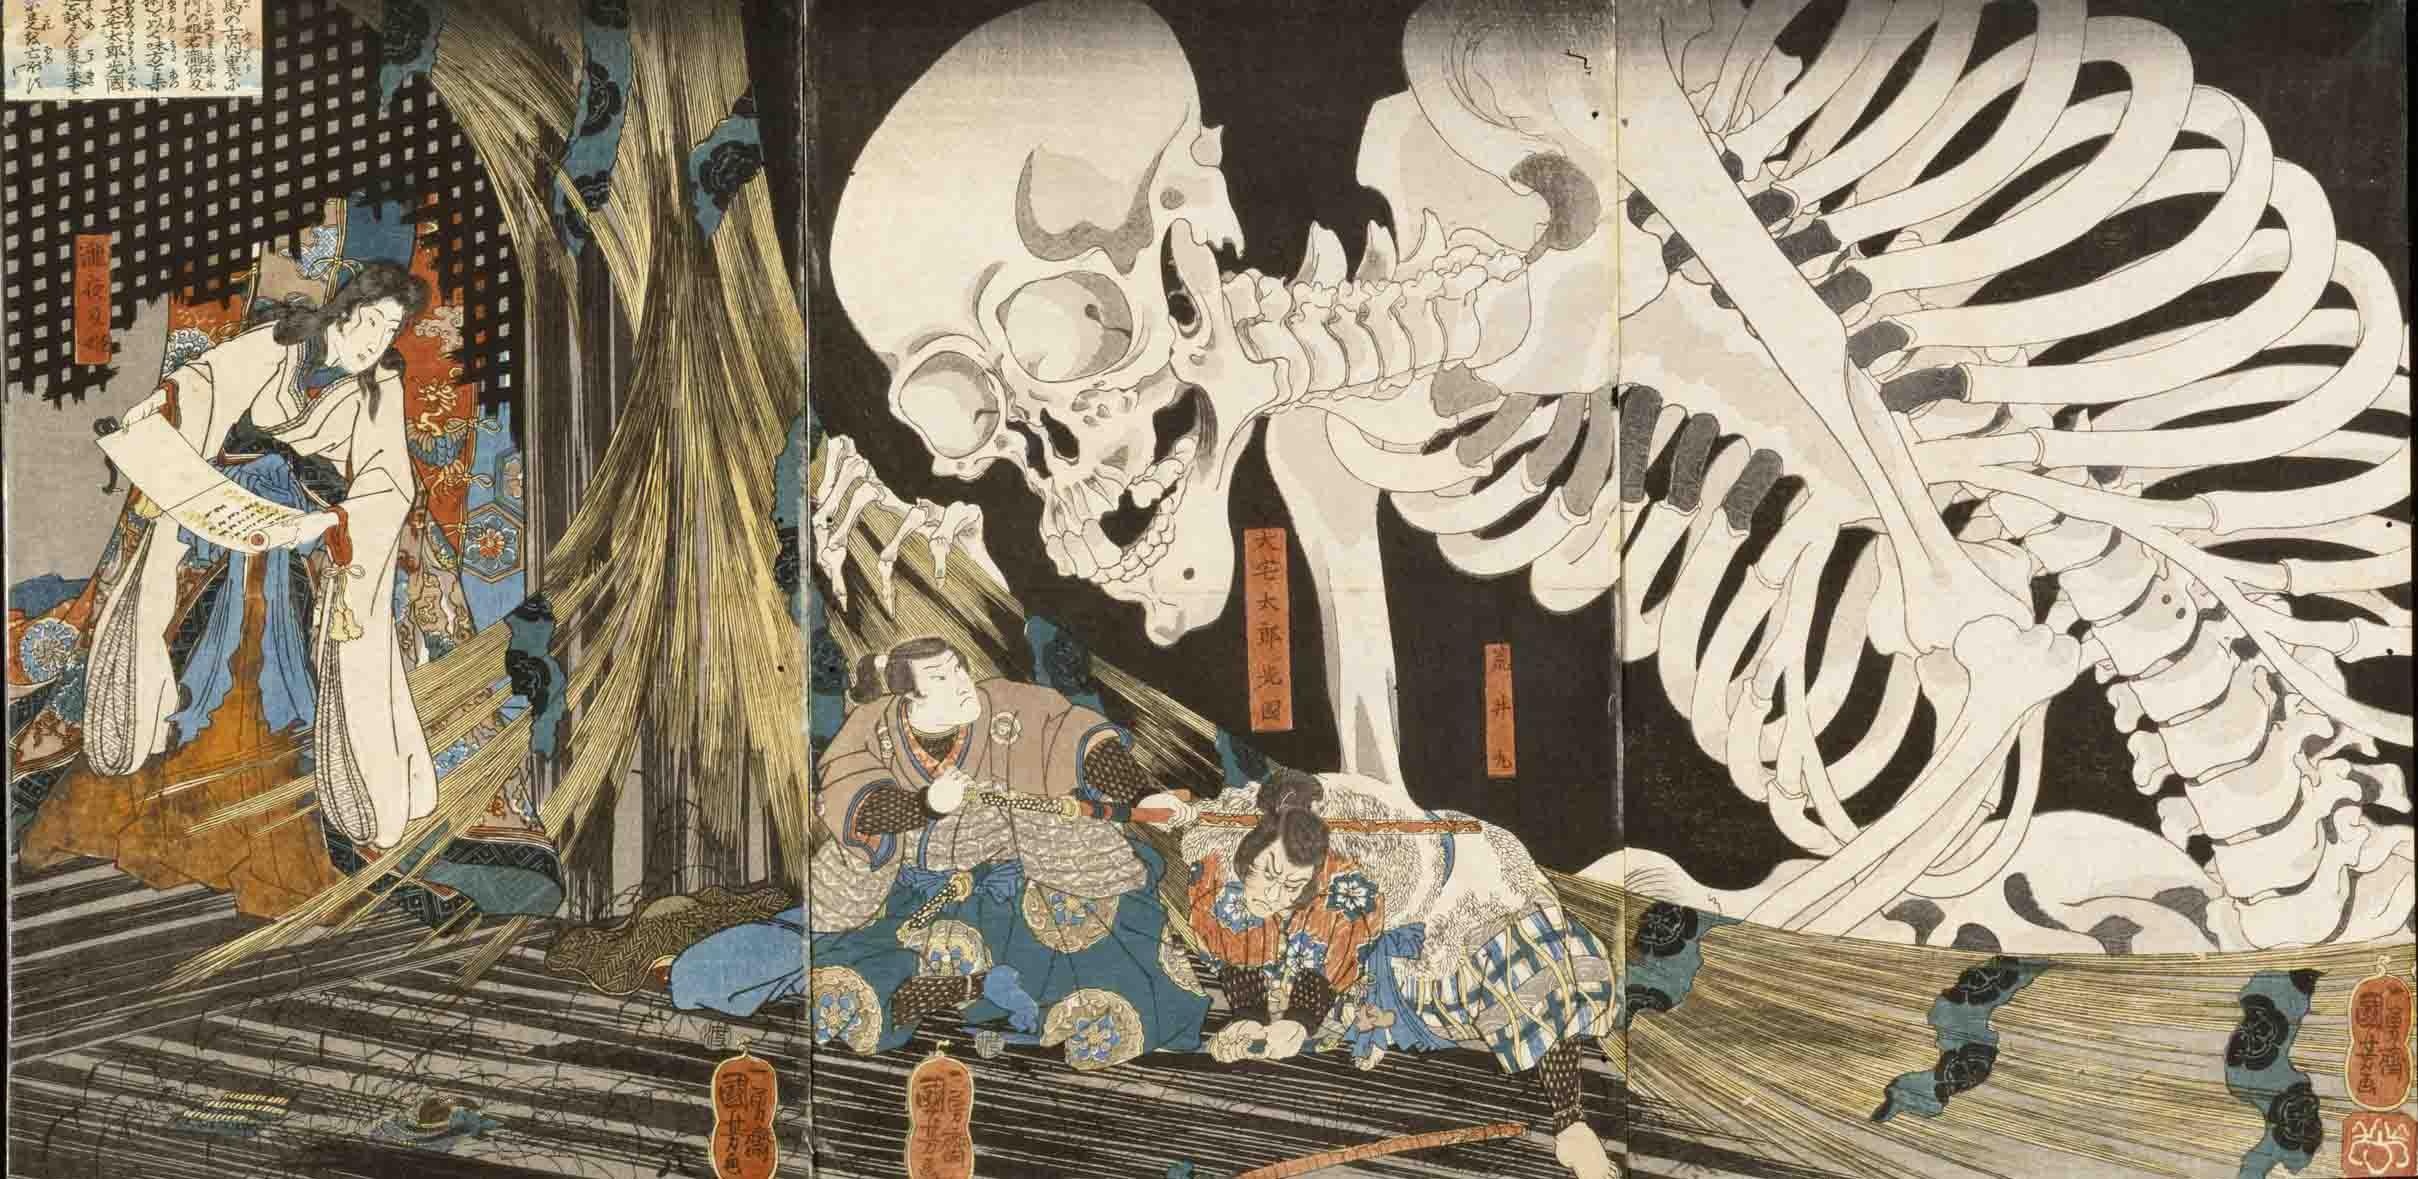 歌川国芳『相馬の古内裏』19世紀 (V&A's collection)